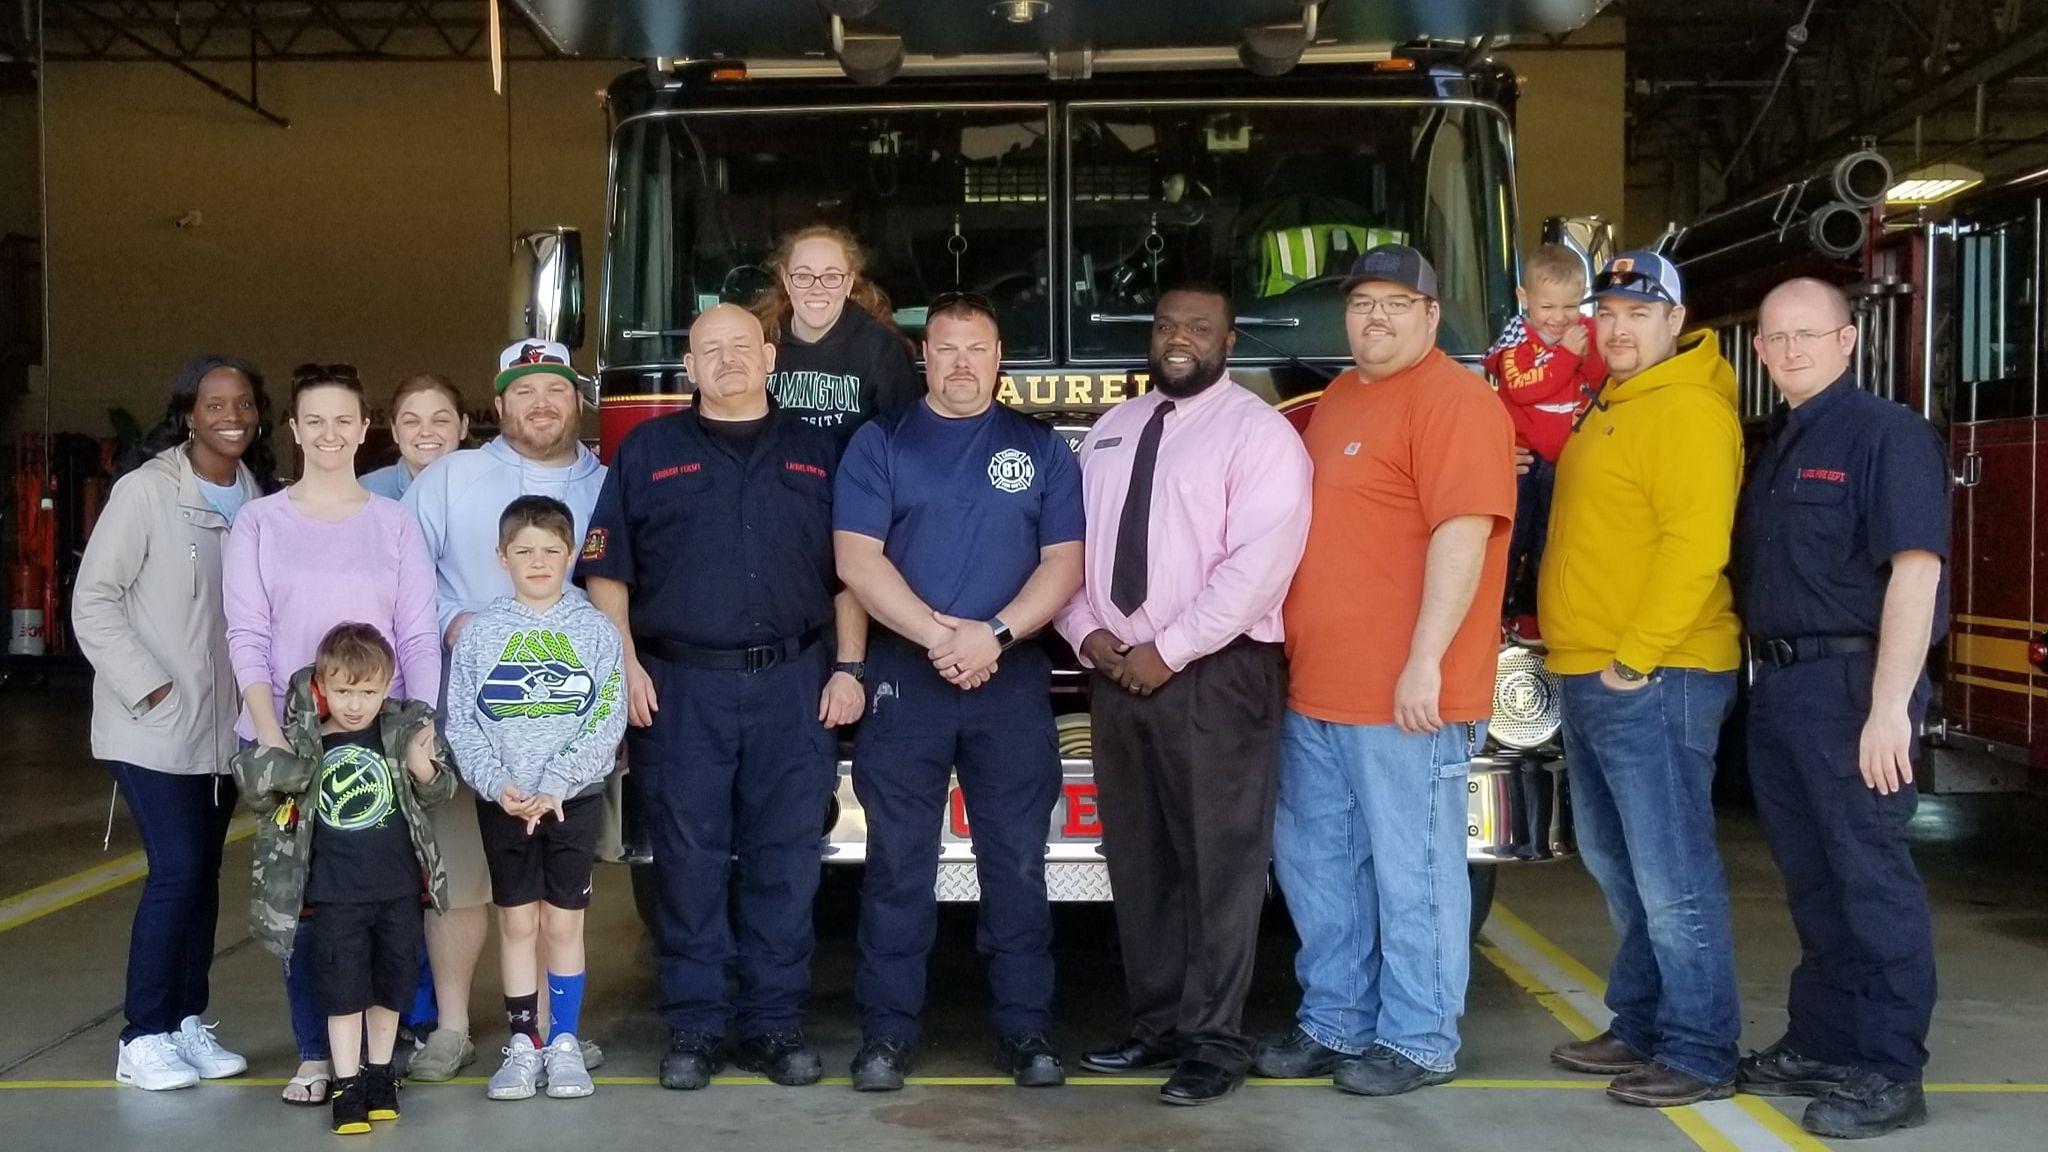 Laurel Little League helps first responders after EF-2